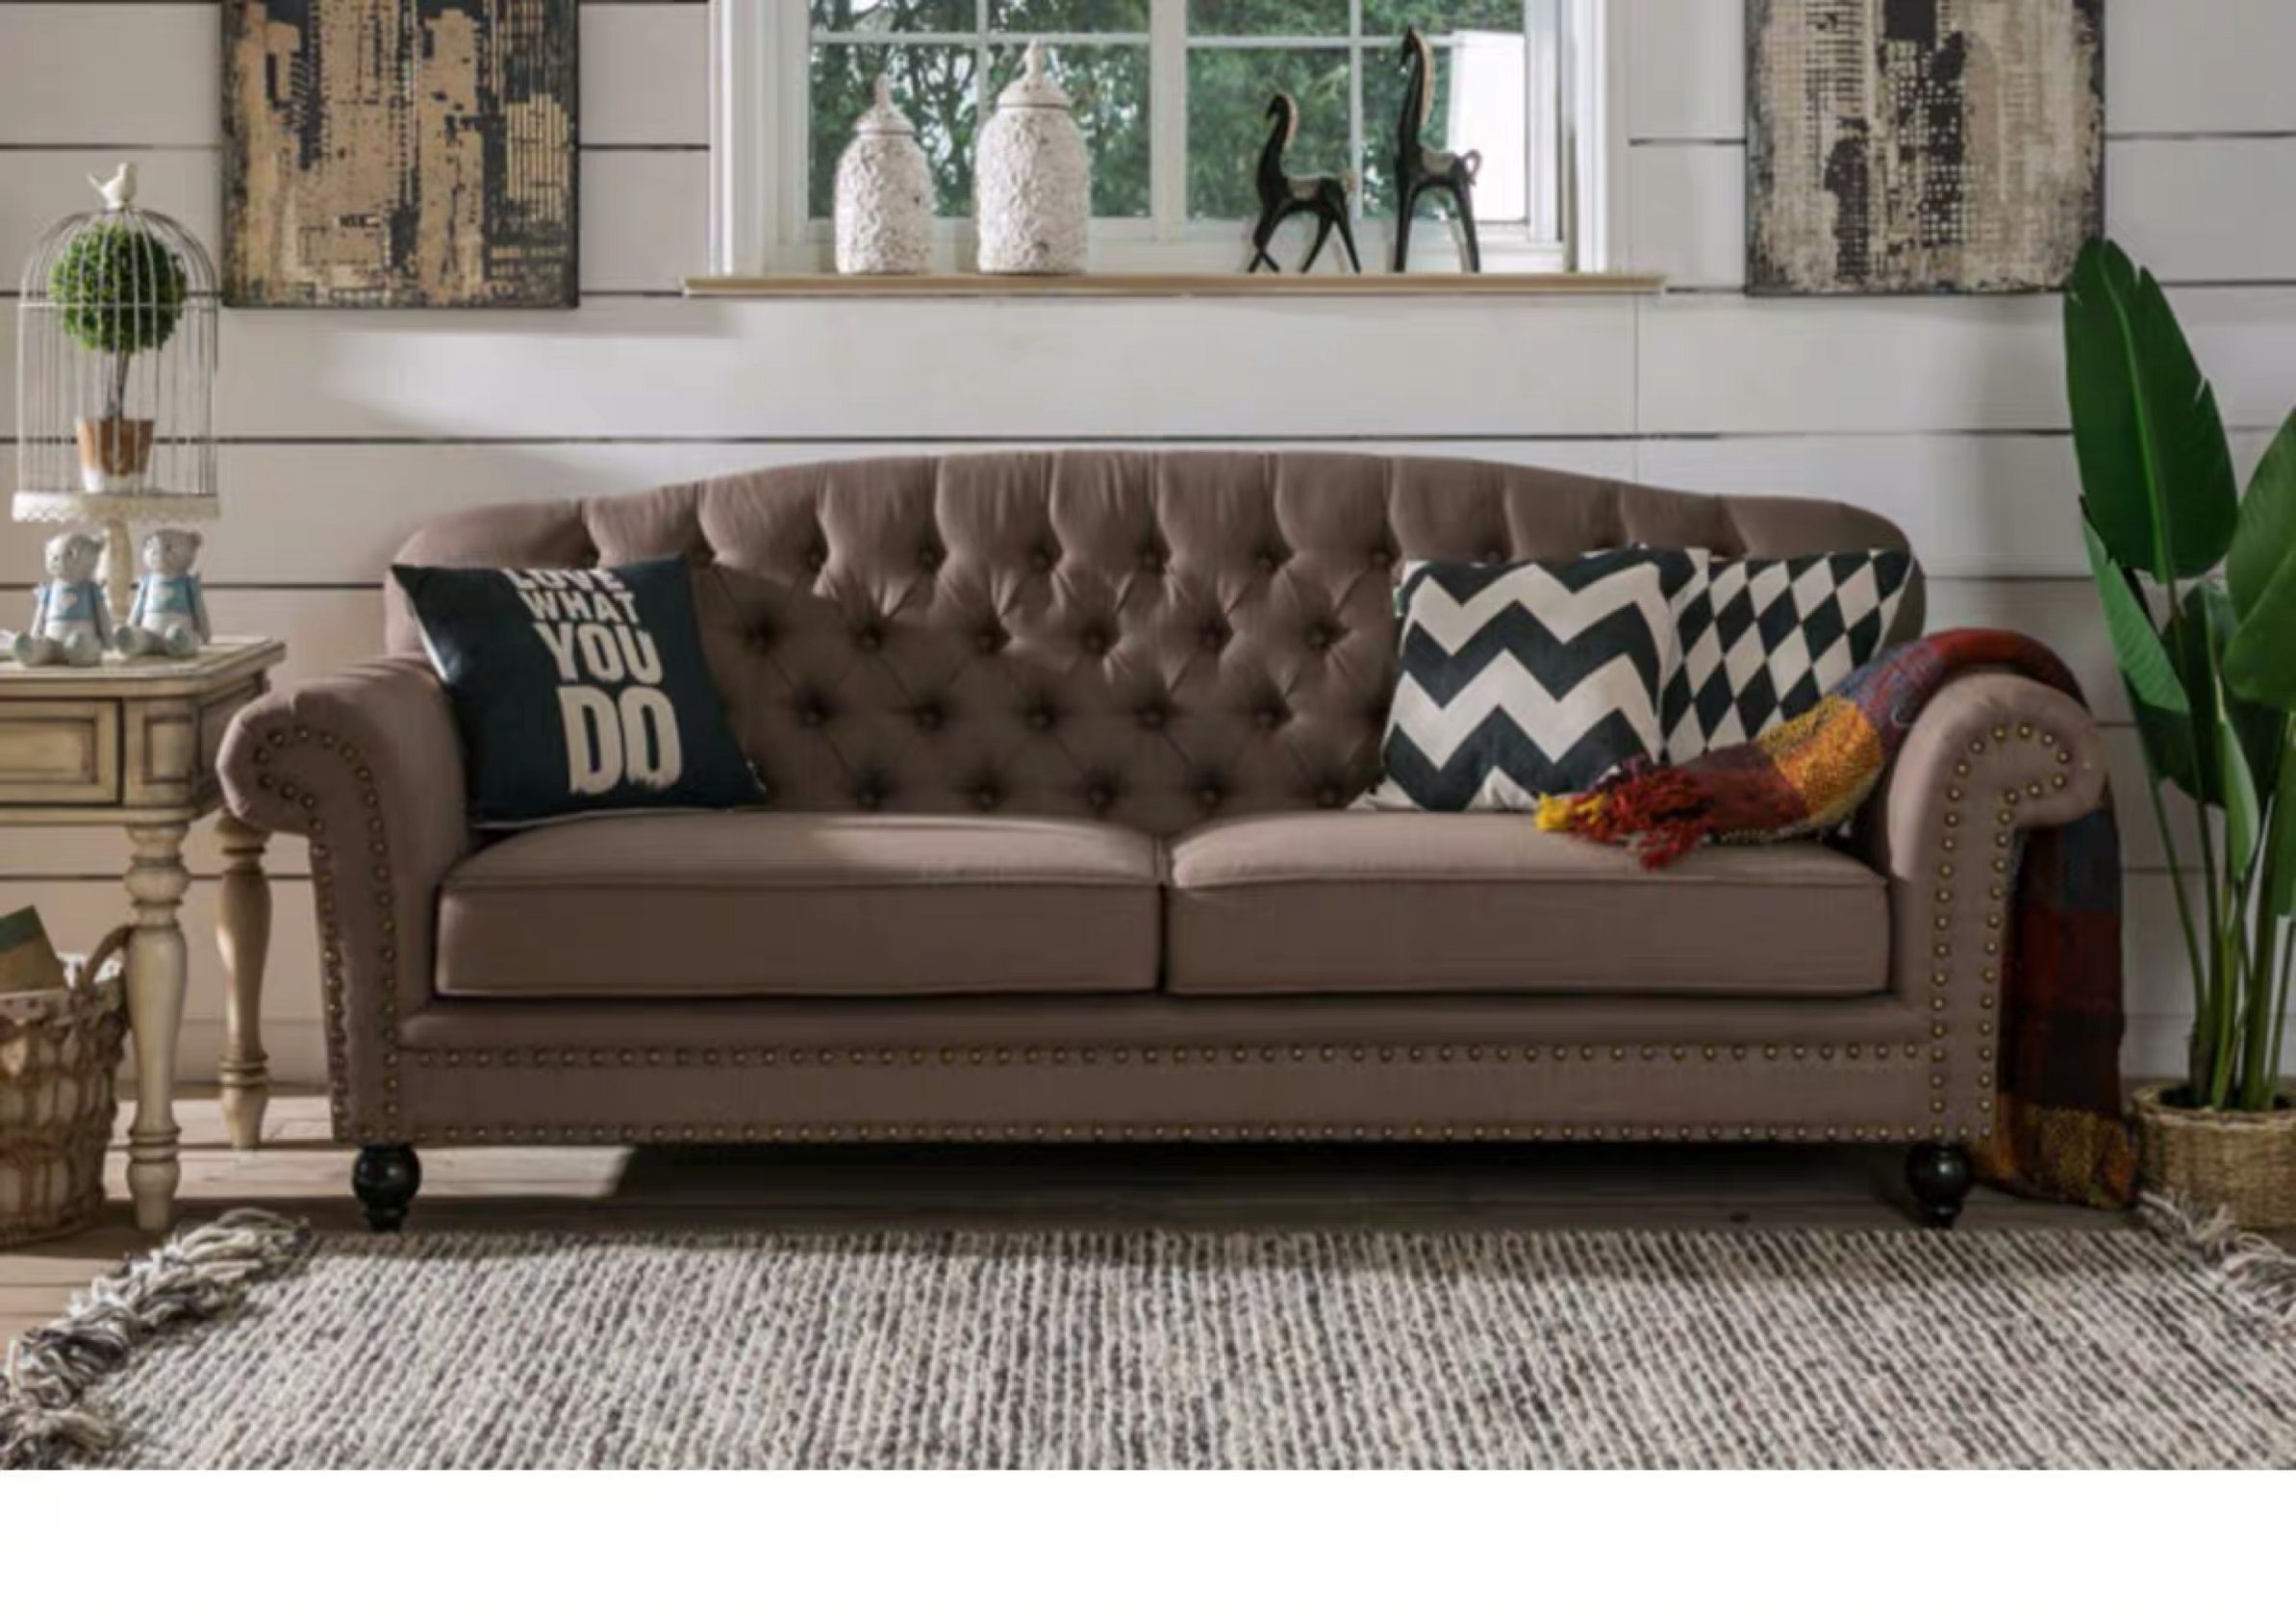 China 2020 Modern Furniture Design 3 Seater Fabric Sofa For Living Room China Living Room Sofa Leather Sofa